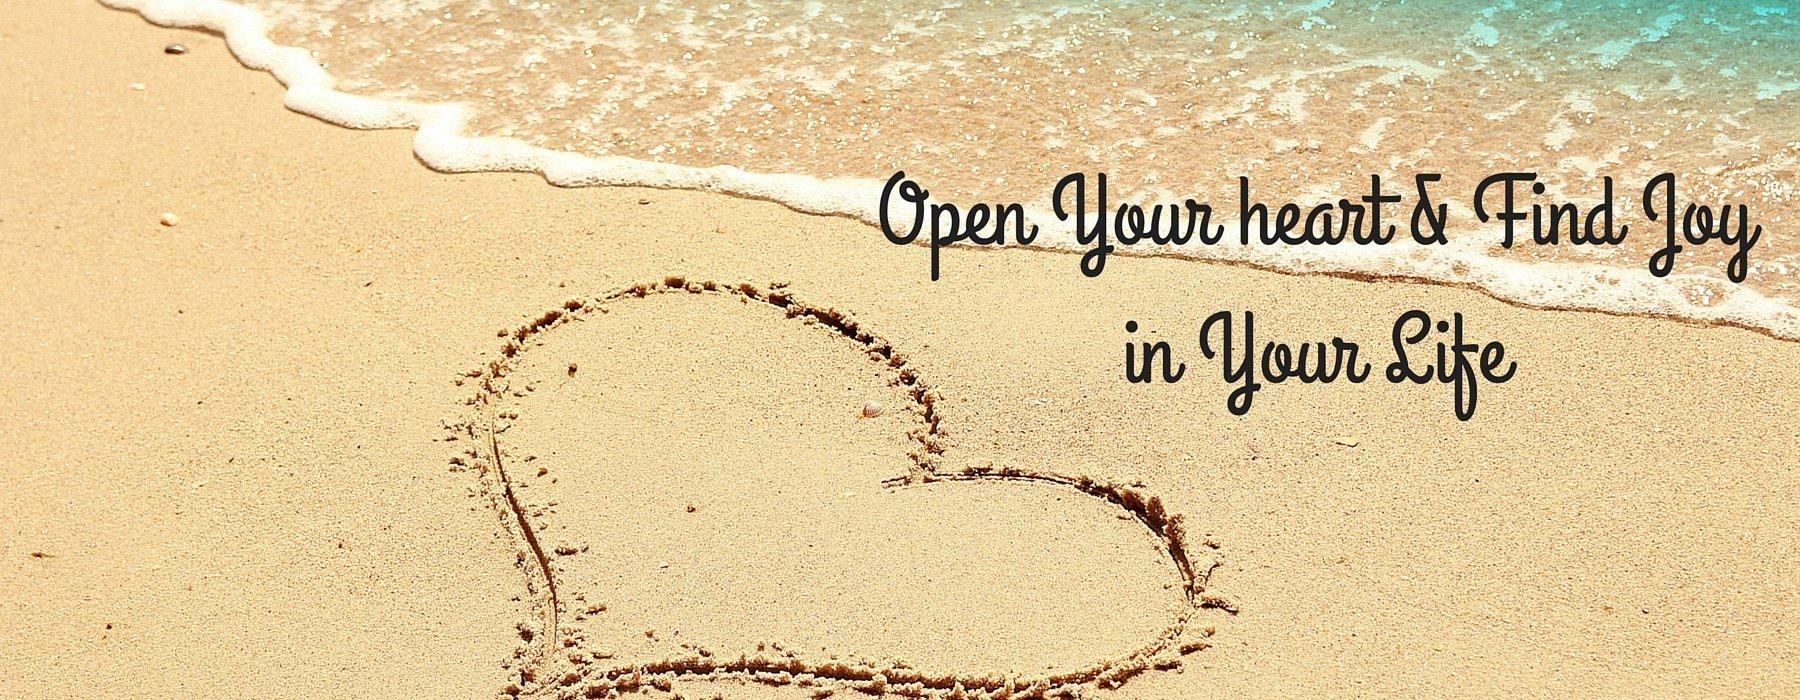 Open-a-Door-to-a-New-WayOf-Being1